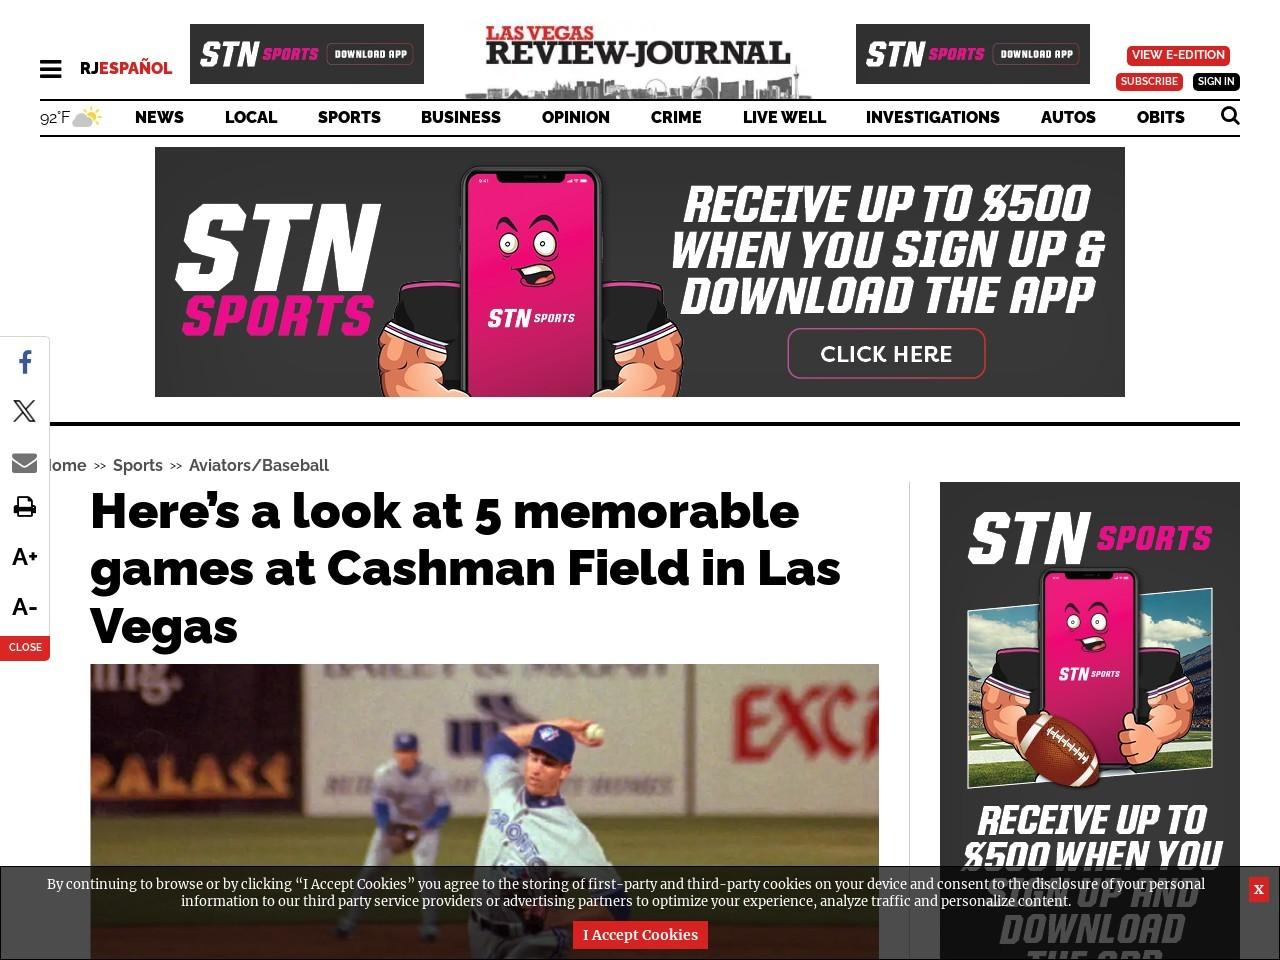 Here's a look at 5 memorable games at Cashman Field in Las Vegas